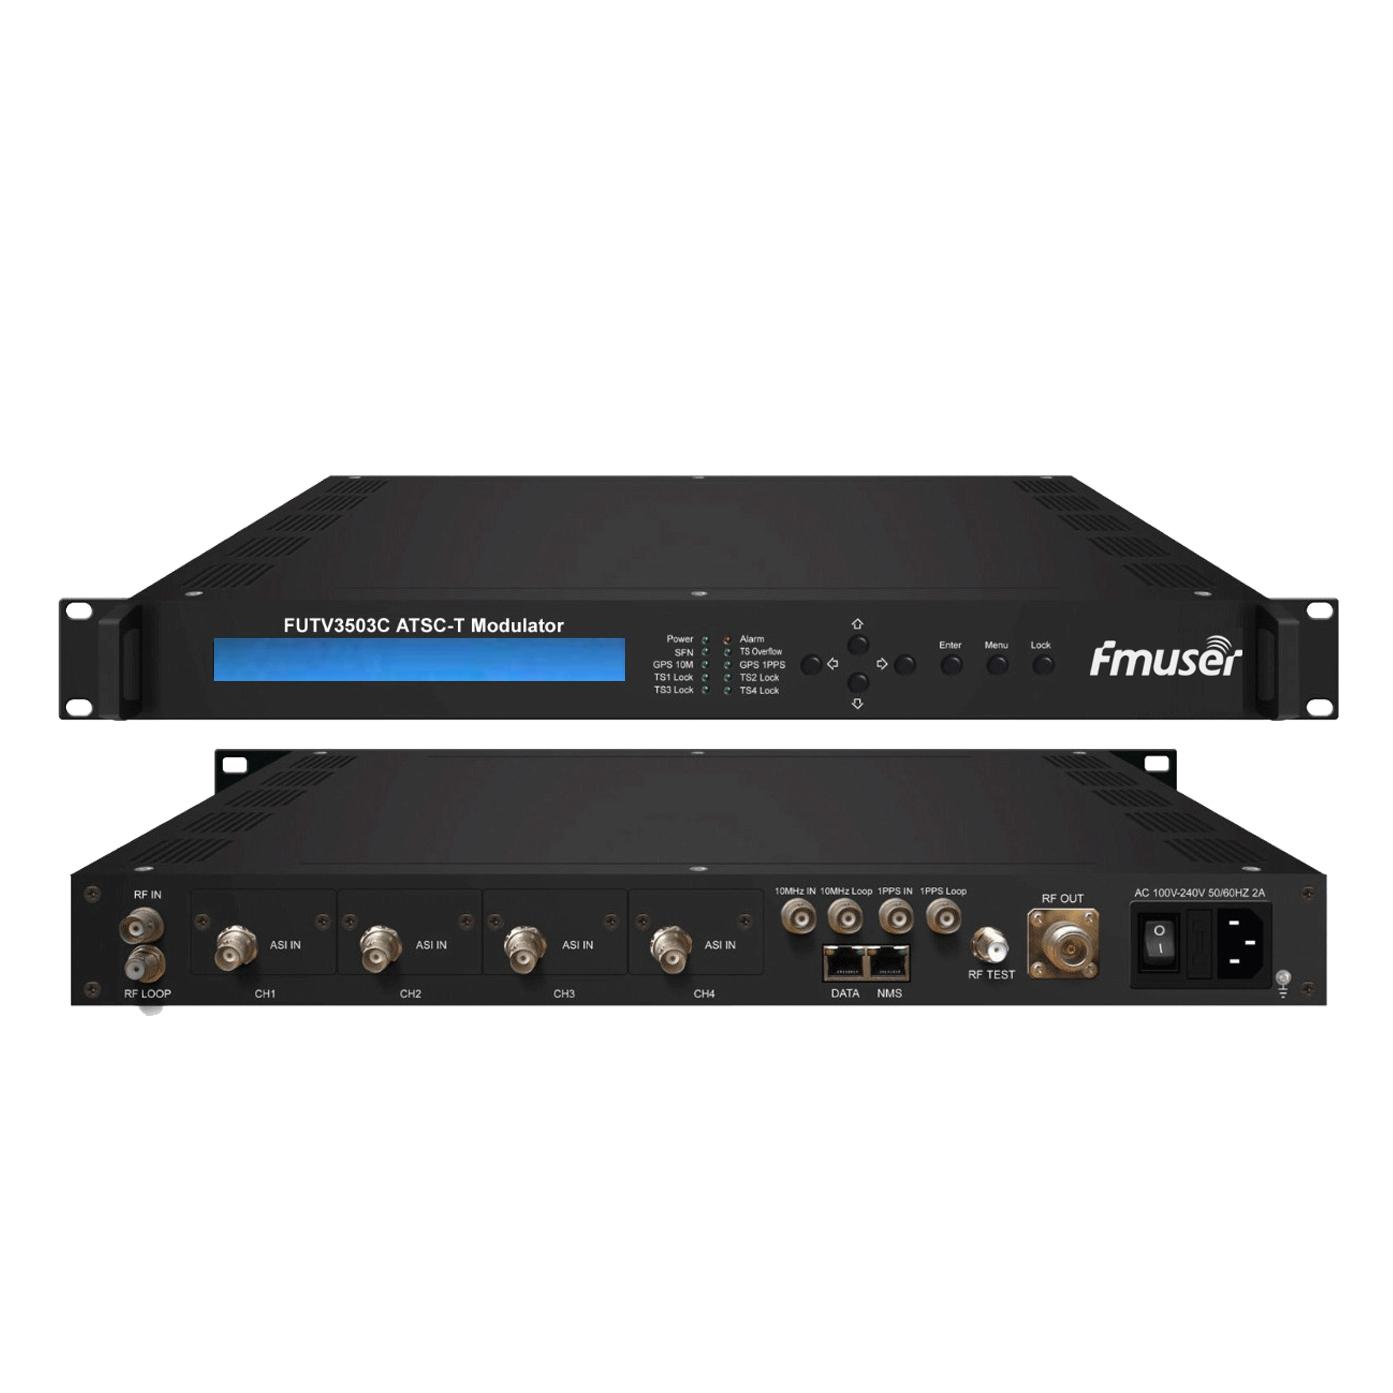 FMUSER FUTV3503C ATSC-T 8VSB Modulator 8-VSB modulasi RF (2 * ASI / 2 * SMPTE 310M input, RF ontput, modulasi ATSC 8VSB) dengan manajemen Jaringan